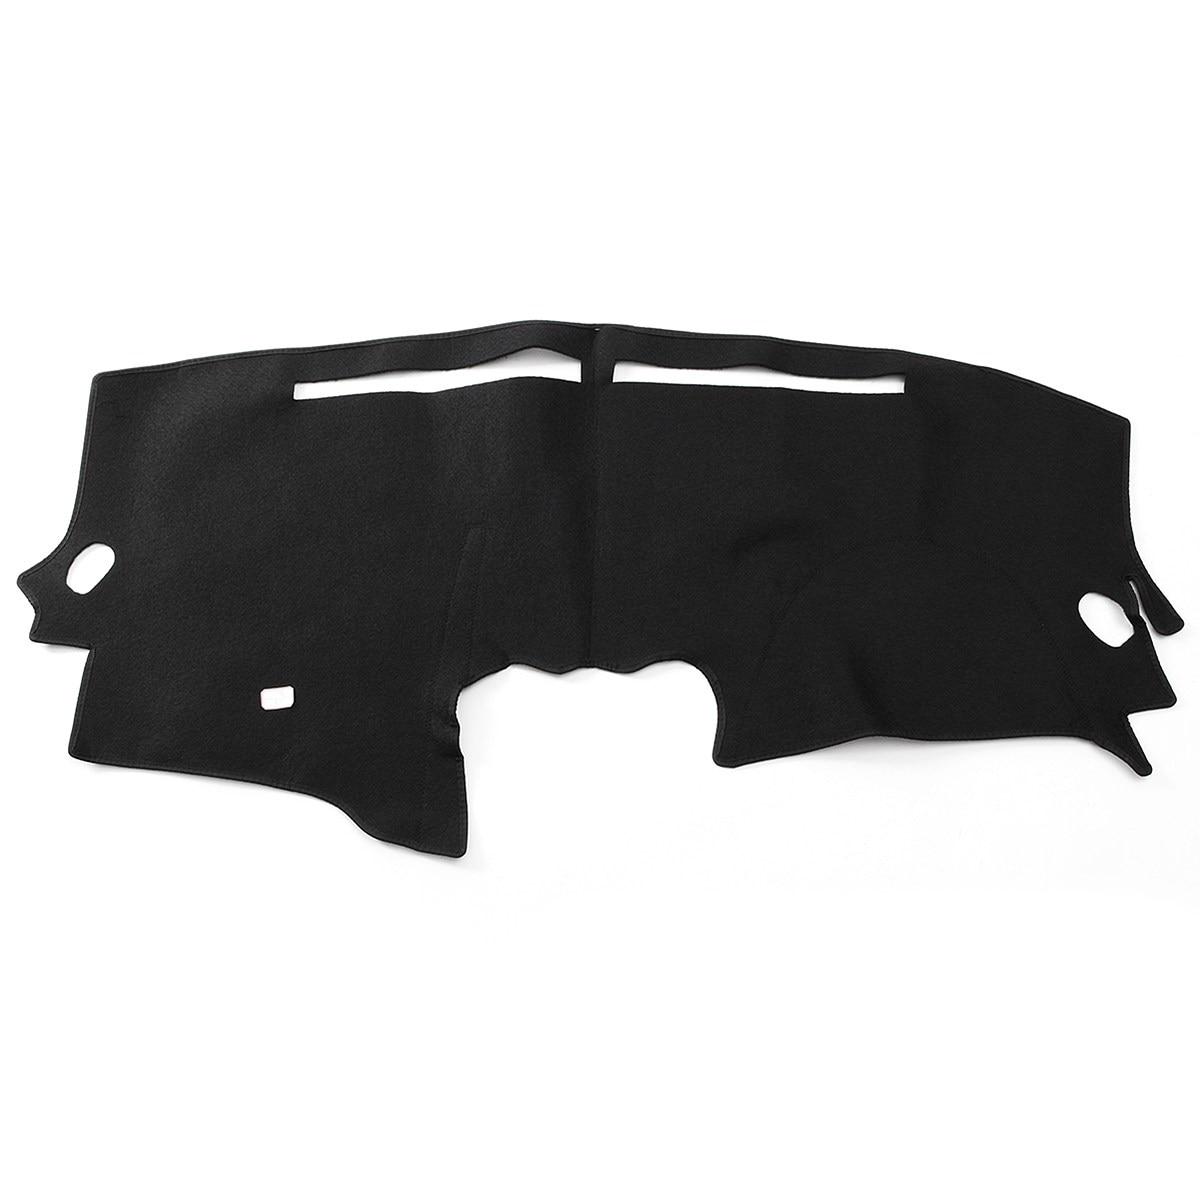 Dashboard Pad Dash Cover Mat Car Interior Dashmat For NISSAN ALTIMA 2007-2012